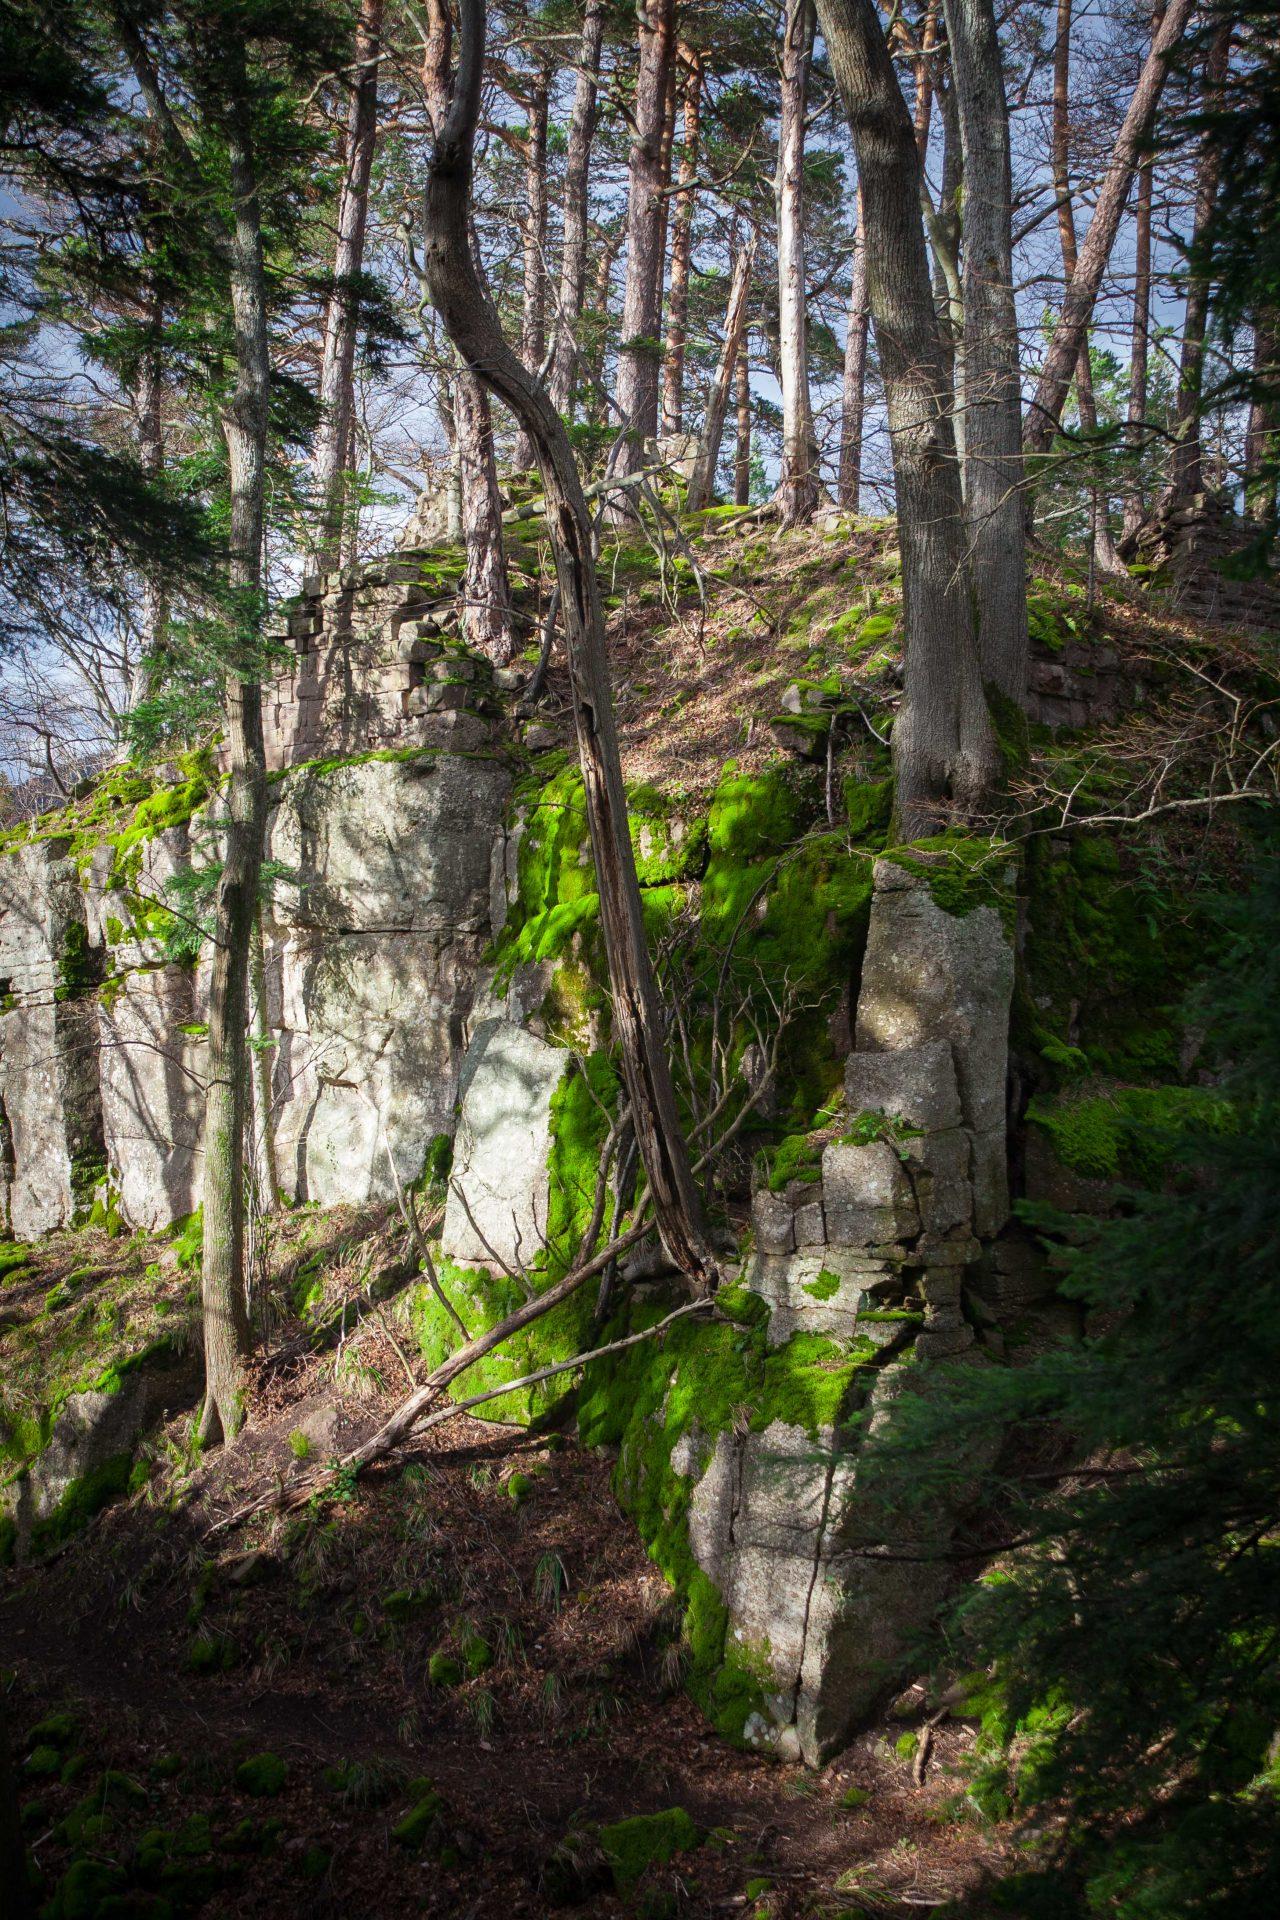 Un mur du château du Hagleschloss dans les Vosges